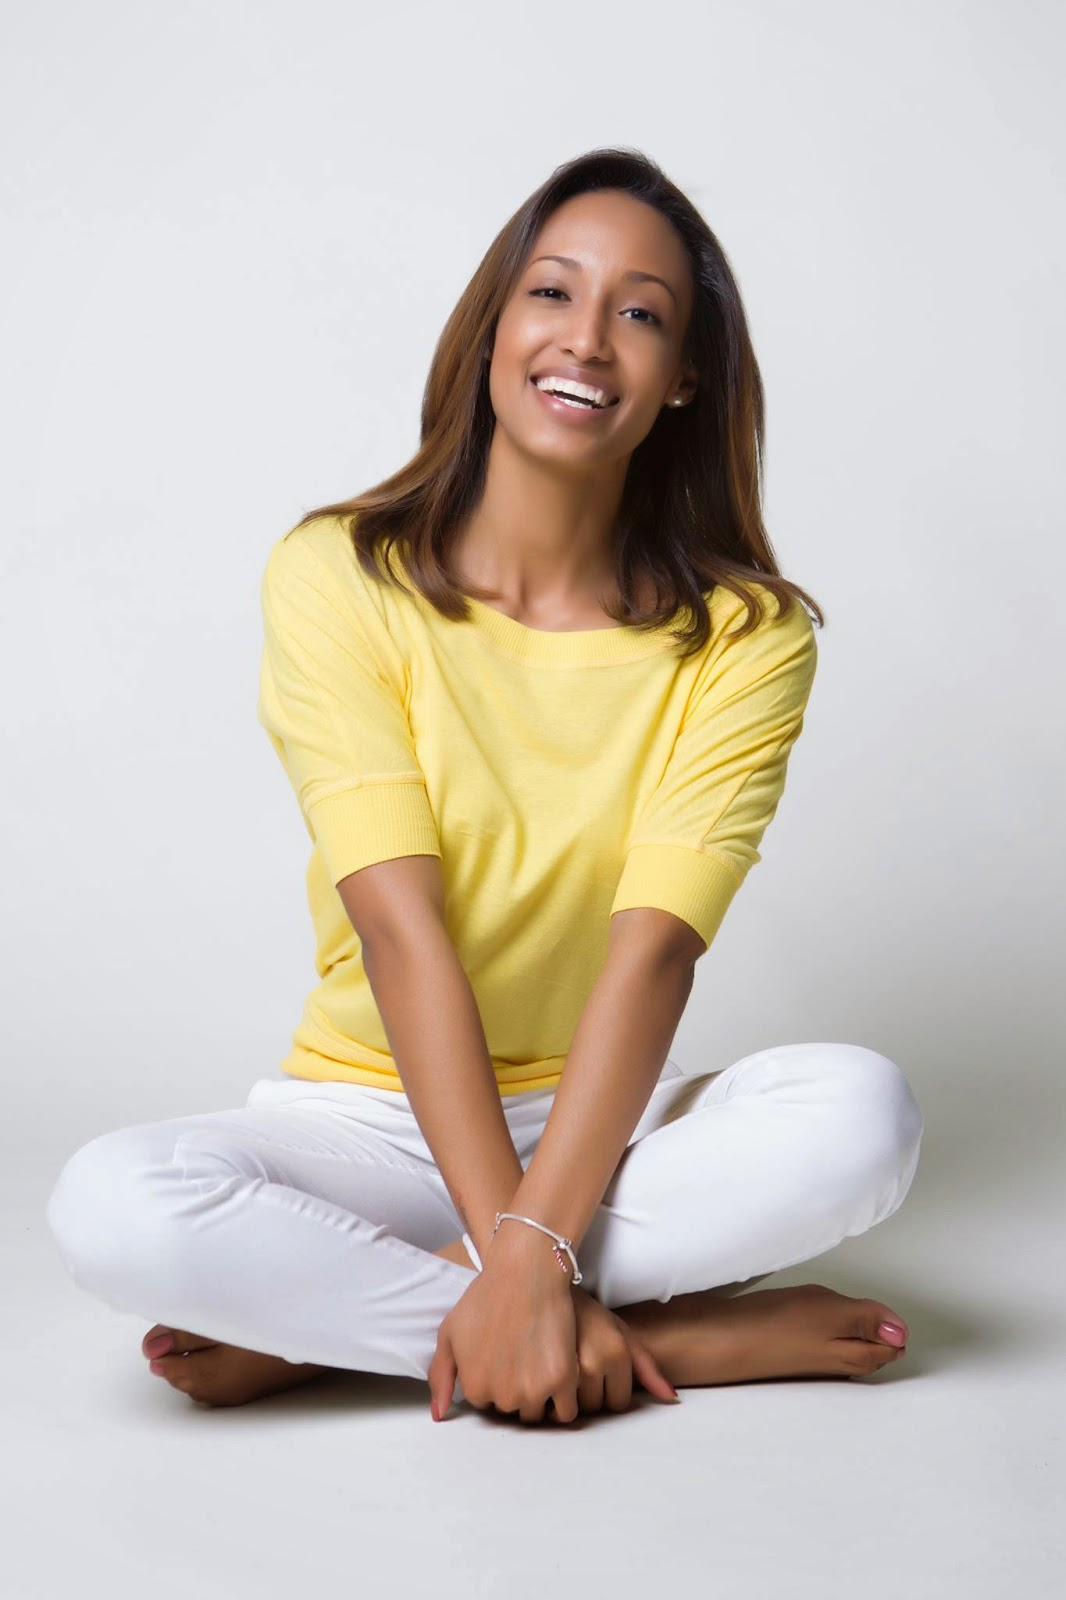 Sheila Marie ~ Model / Actress - Vision Studios Photography